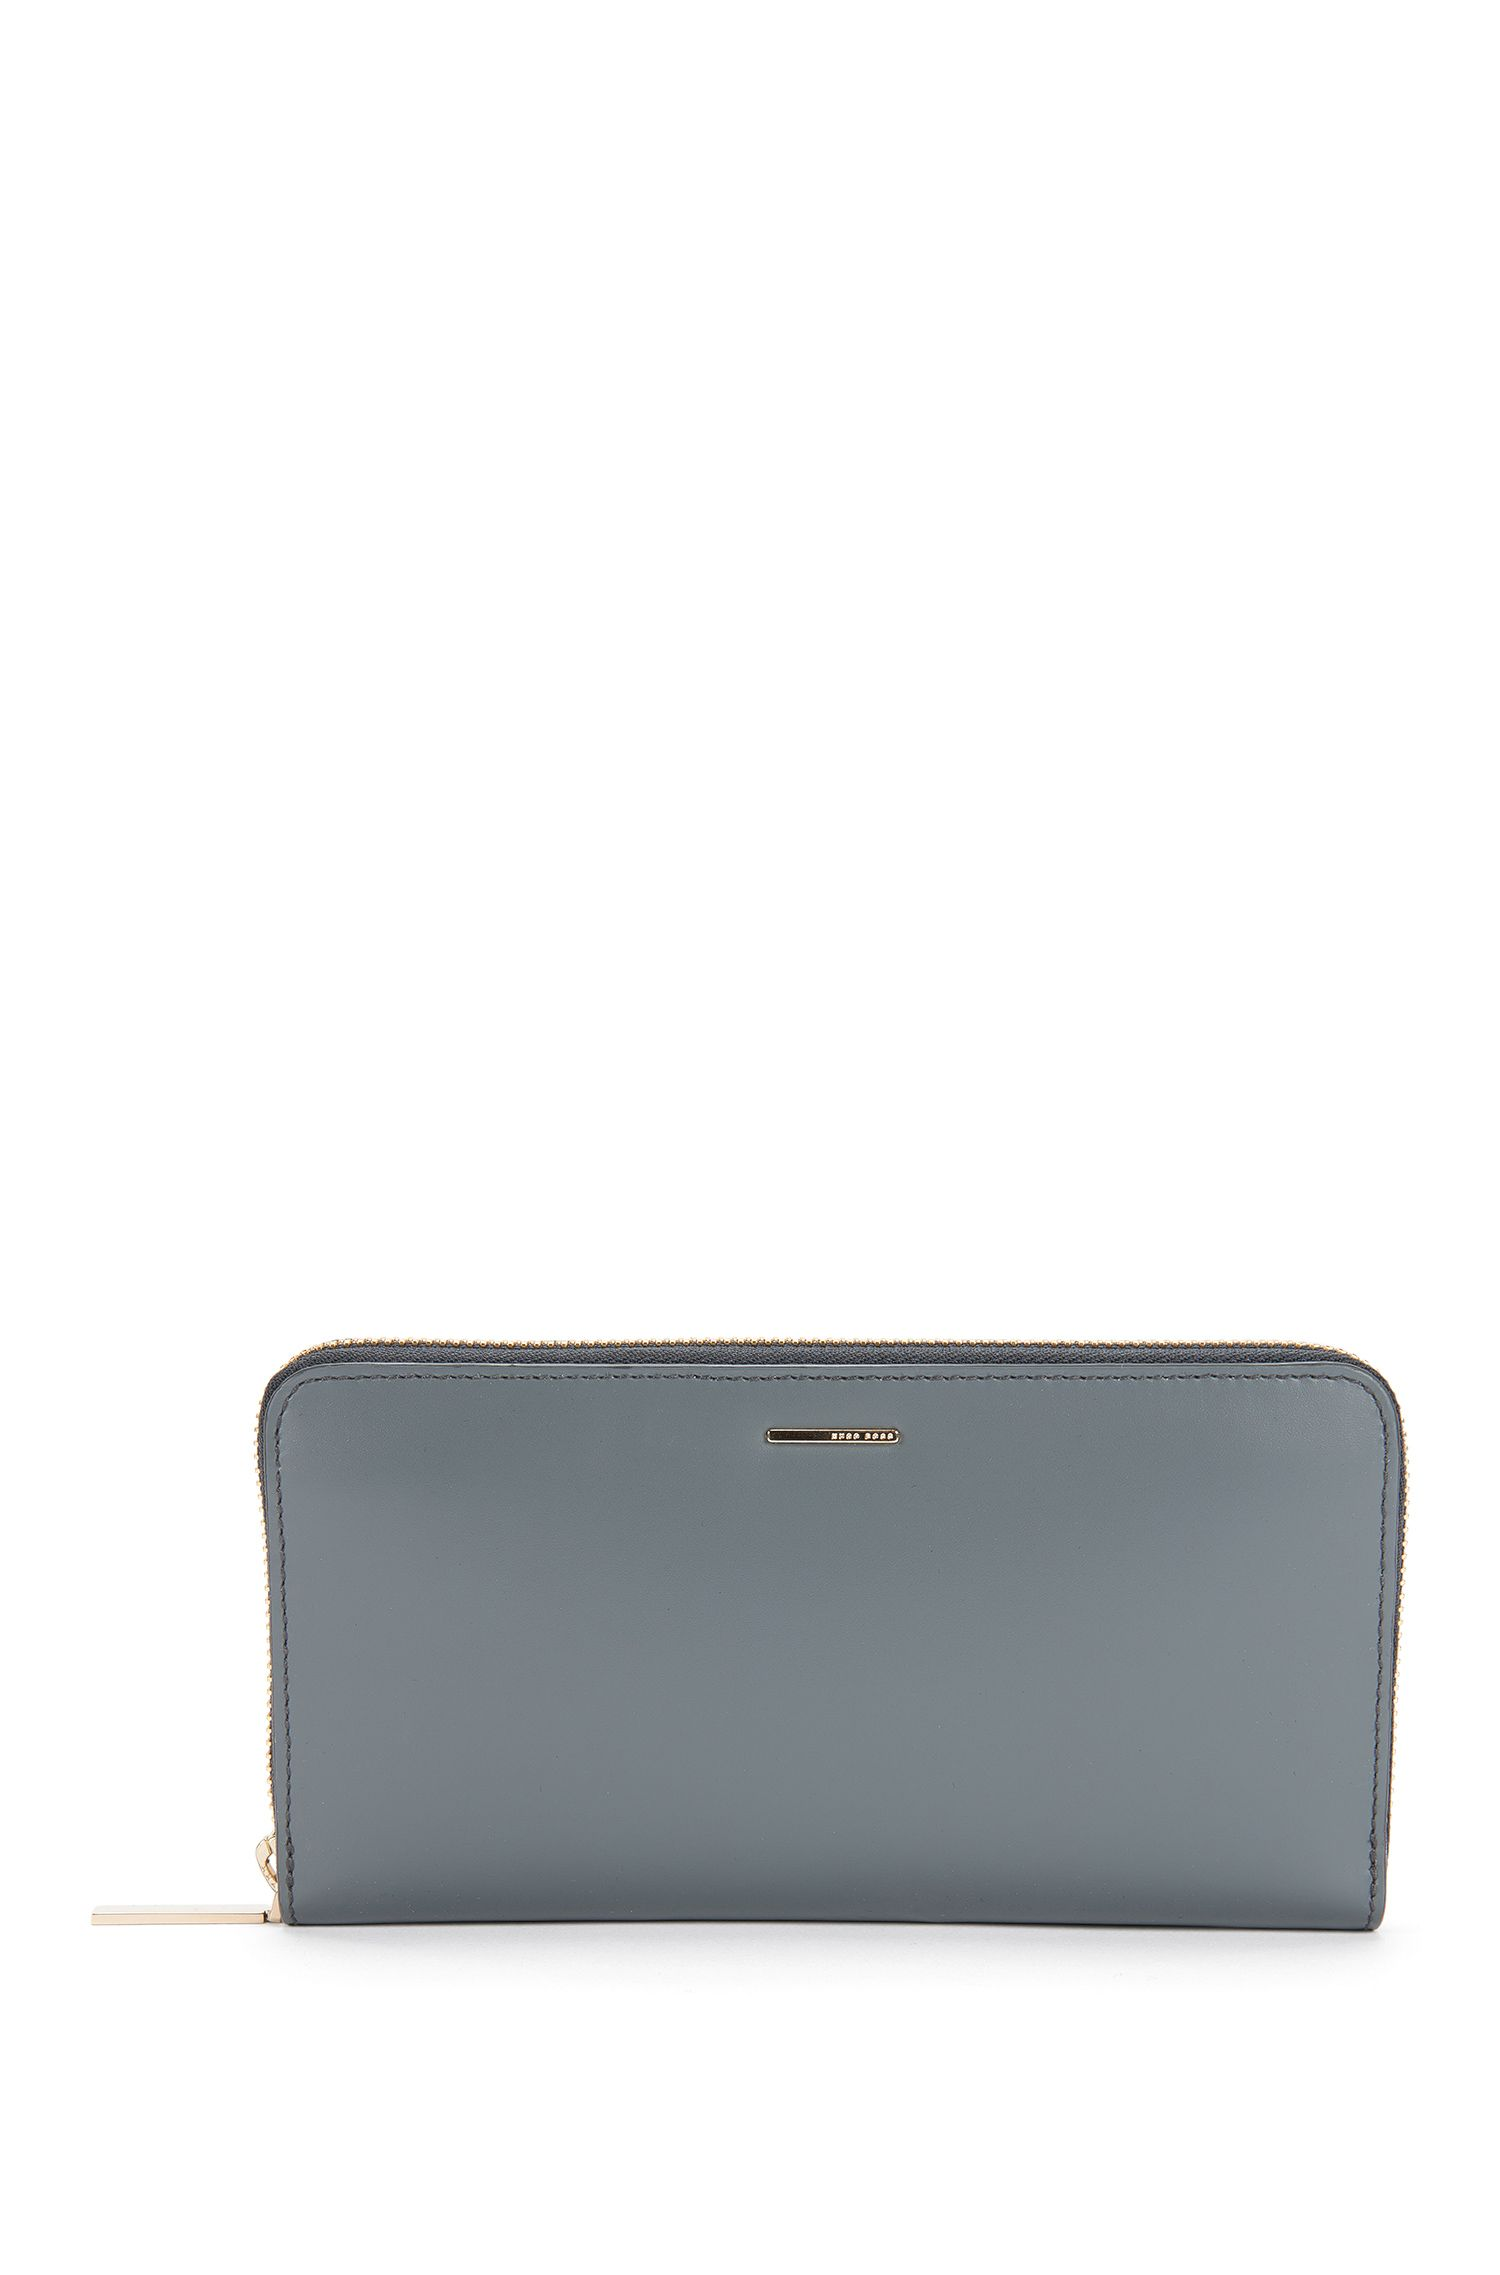 'Staple Ziparound-C' | Leather Zip Wallet